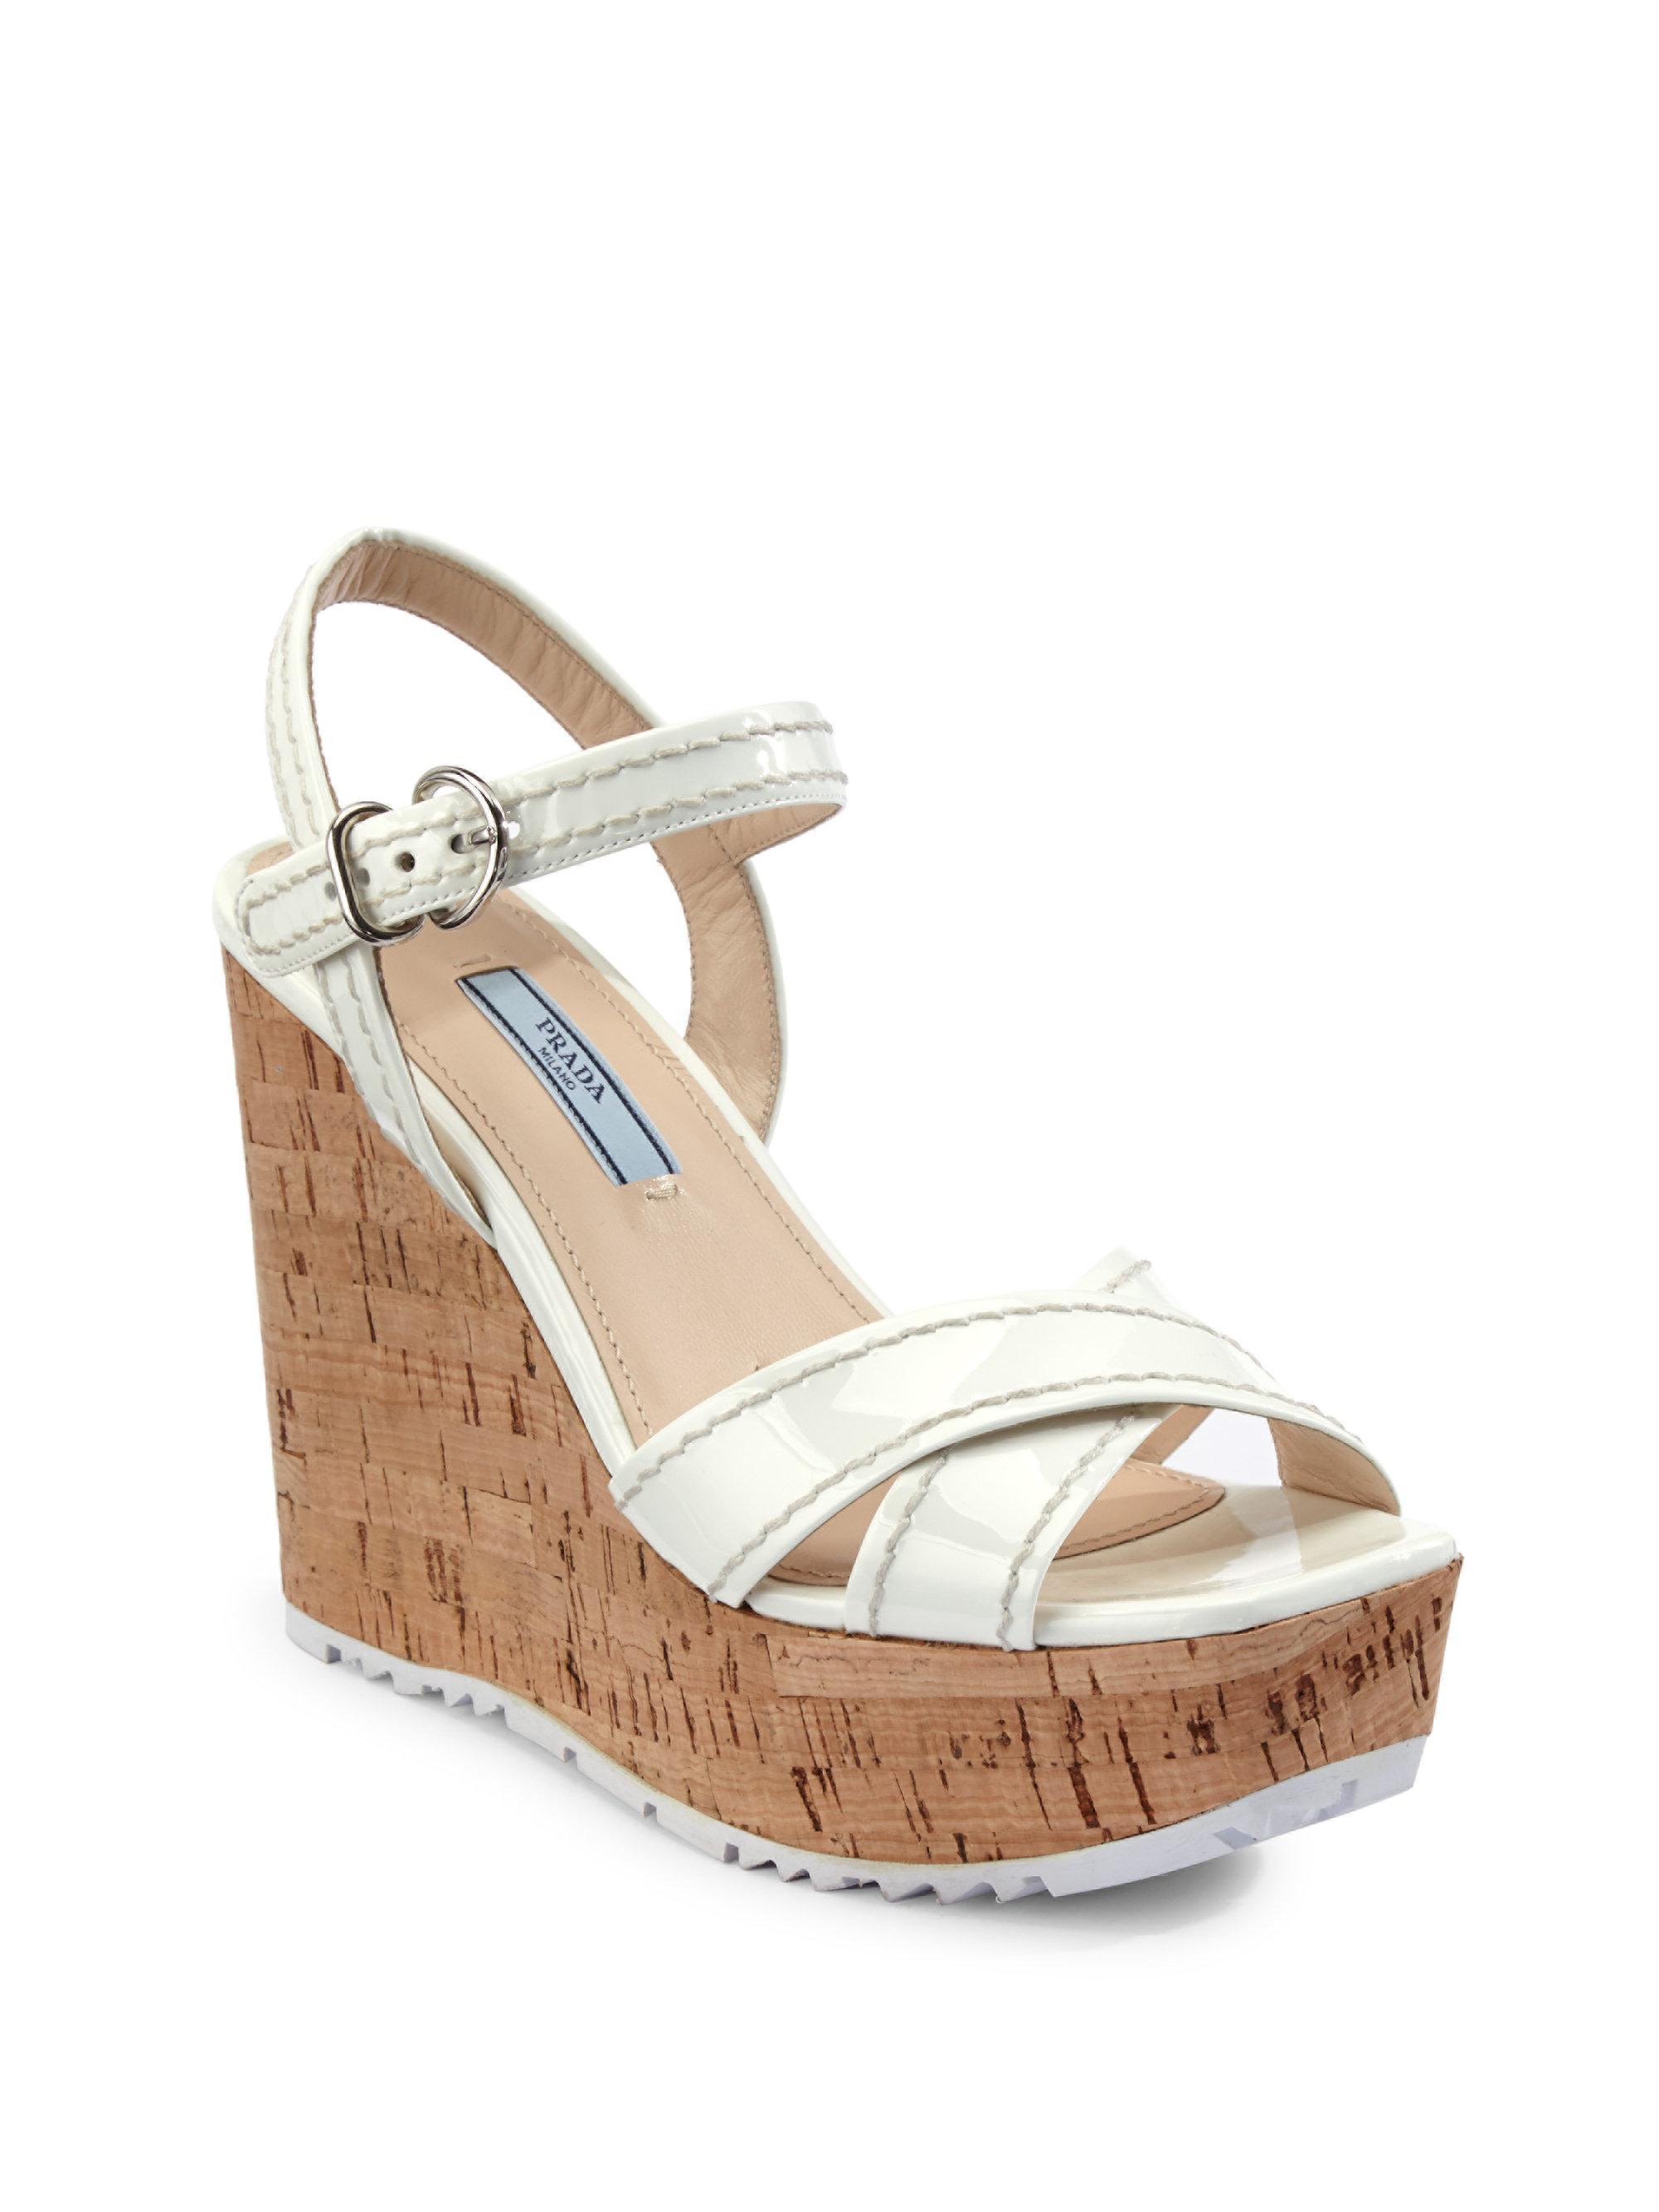 ff28ef93d875 Lyst - Prada Leather Platform Wedge Sandals in Metallic